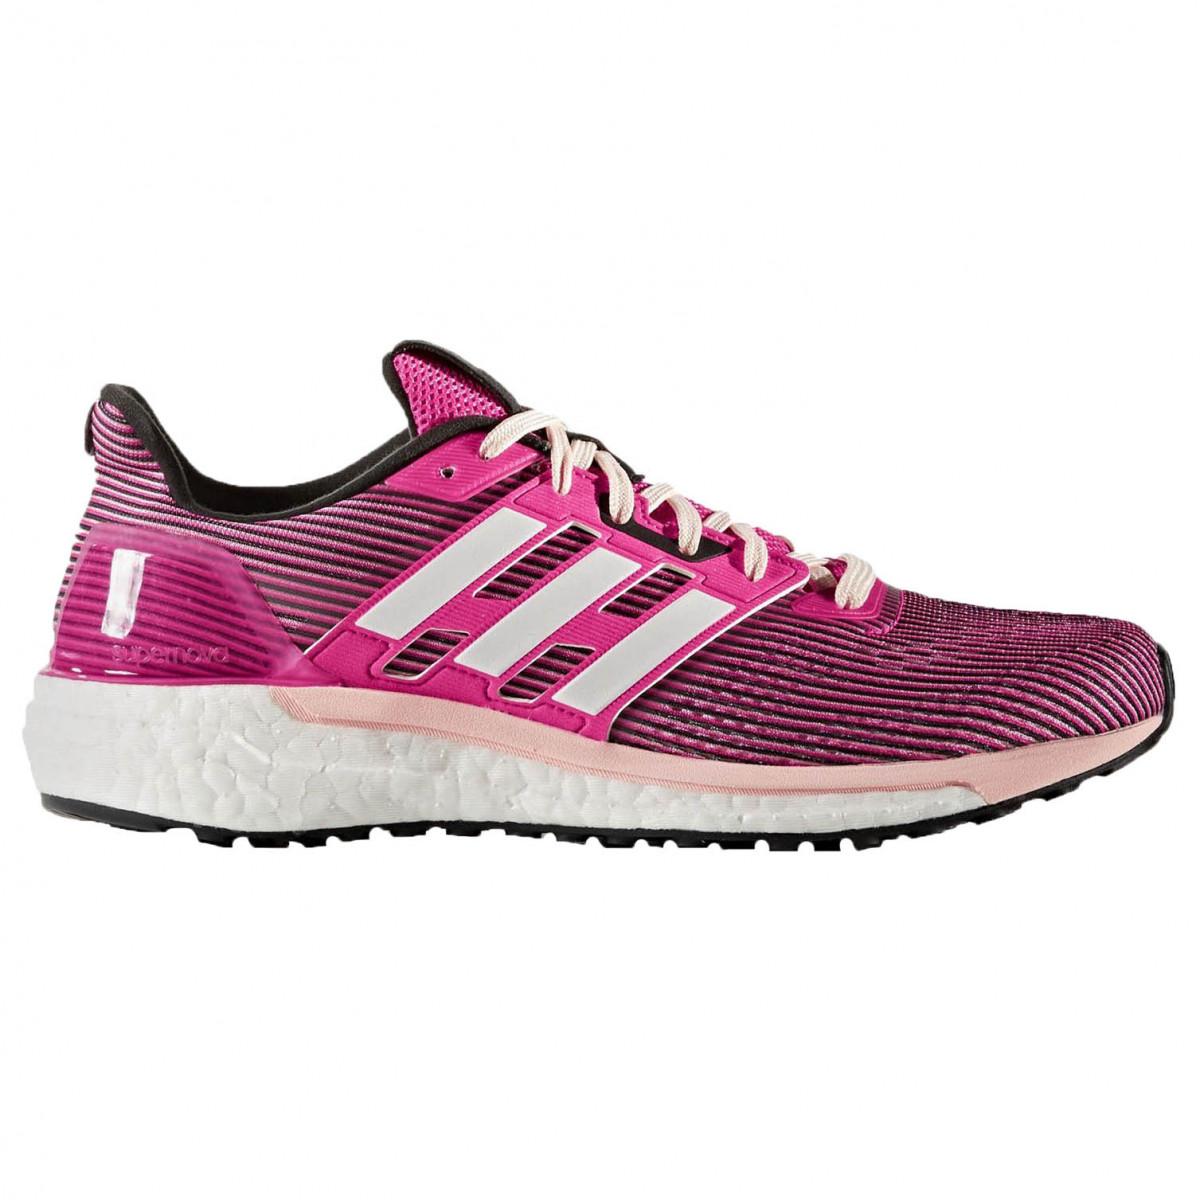 Zapatillas Adidas Supernova W